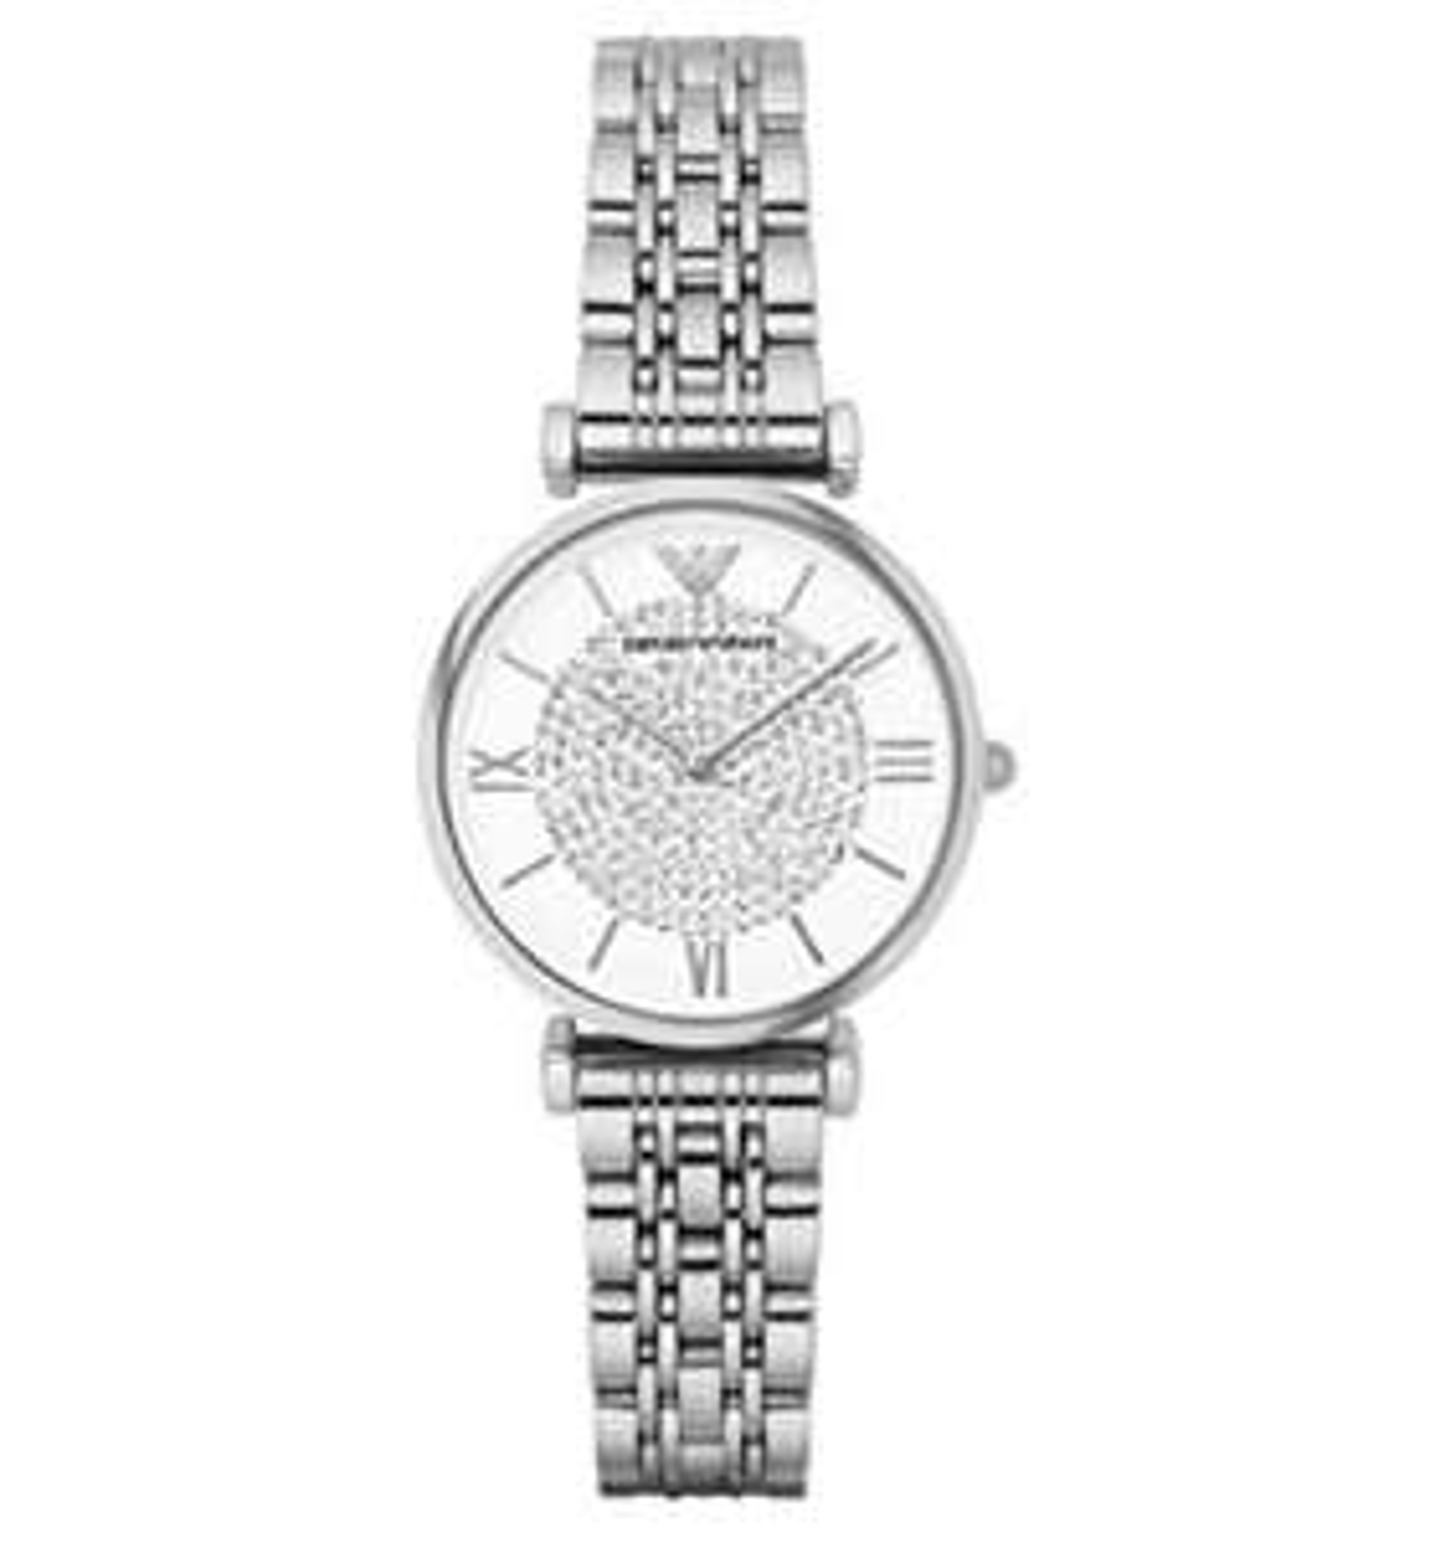 Emporio Armani dames horloge (AR1925) @ Amazon.nl